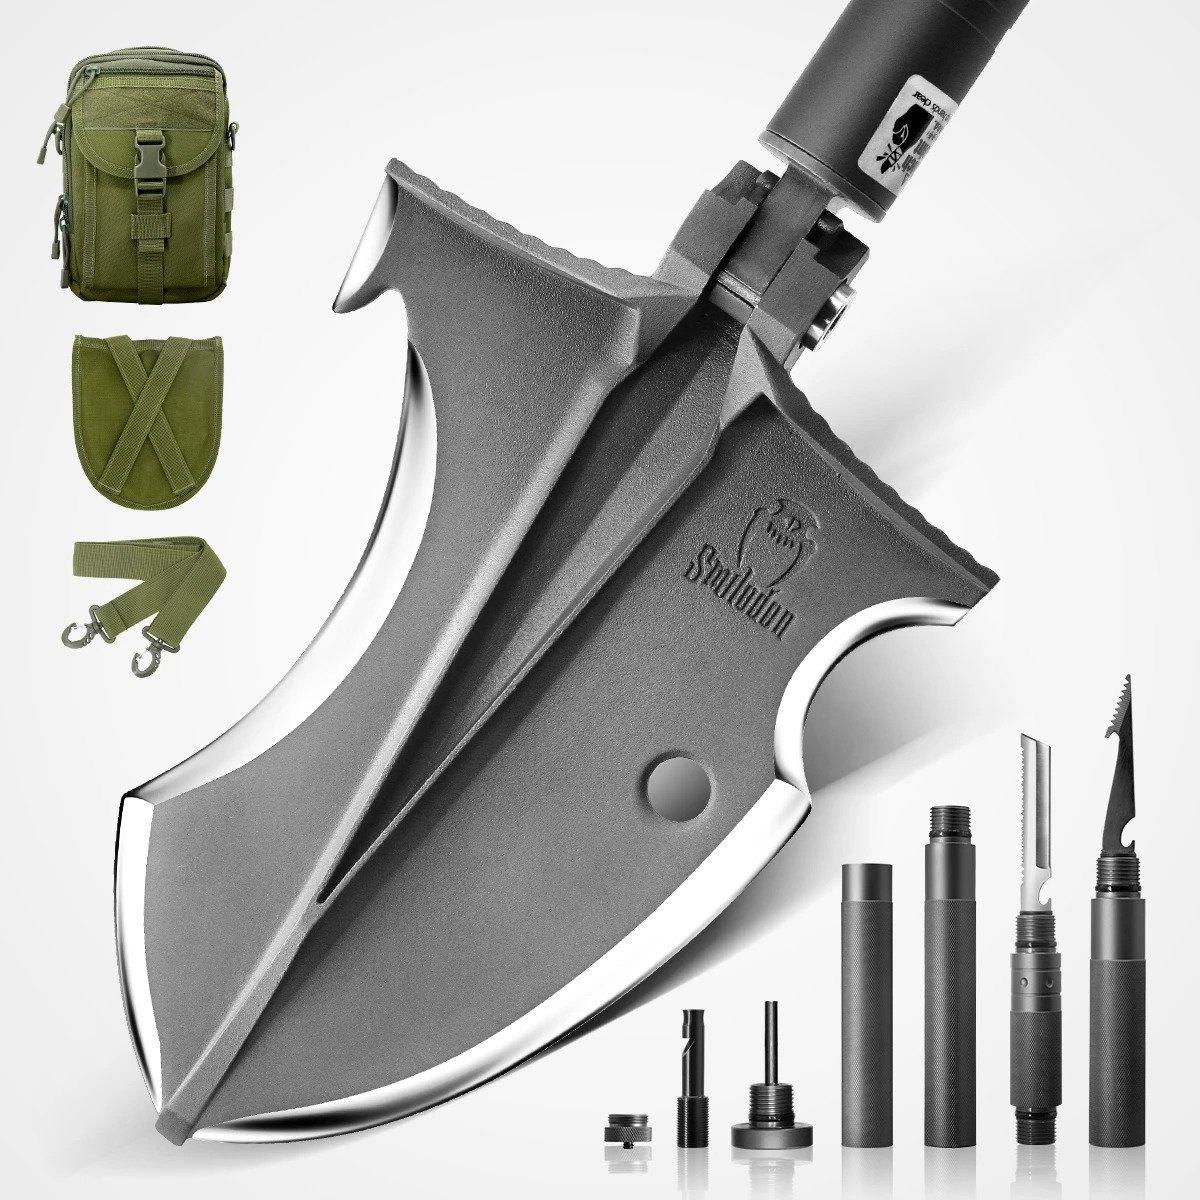 Smilodon Camper Survival Shovel